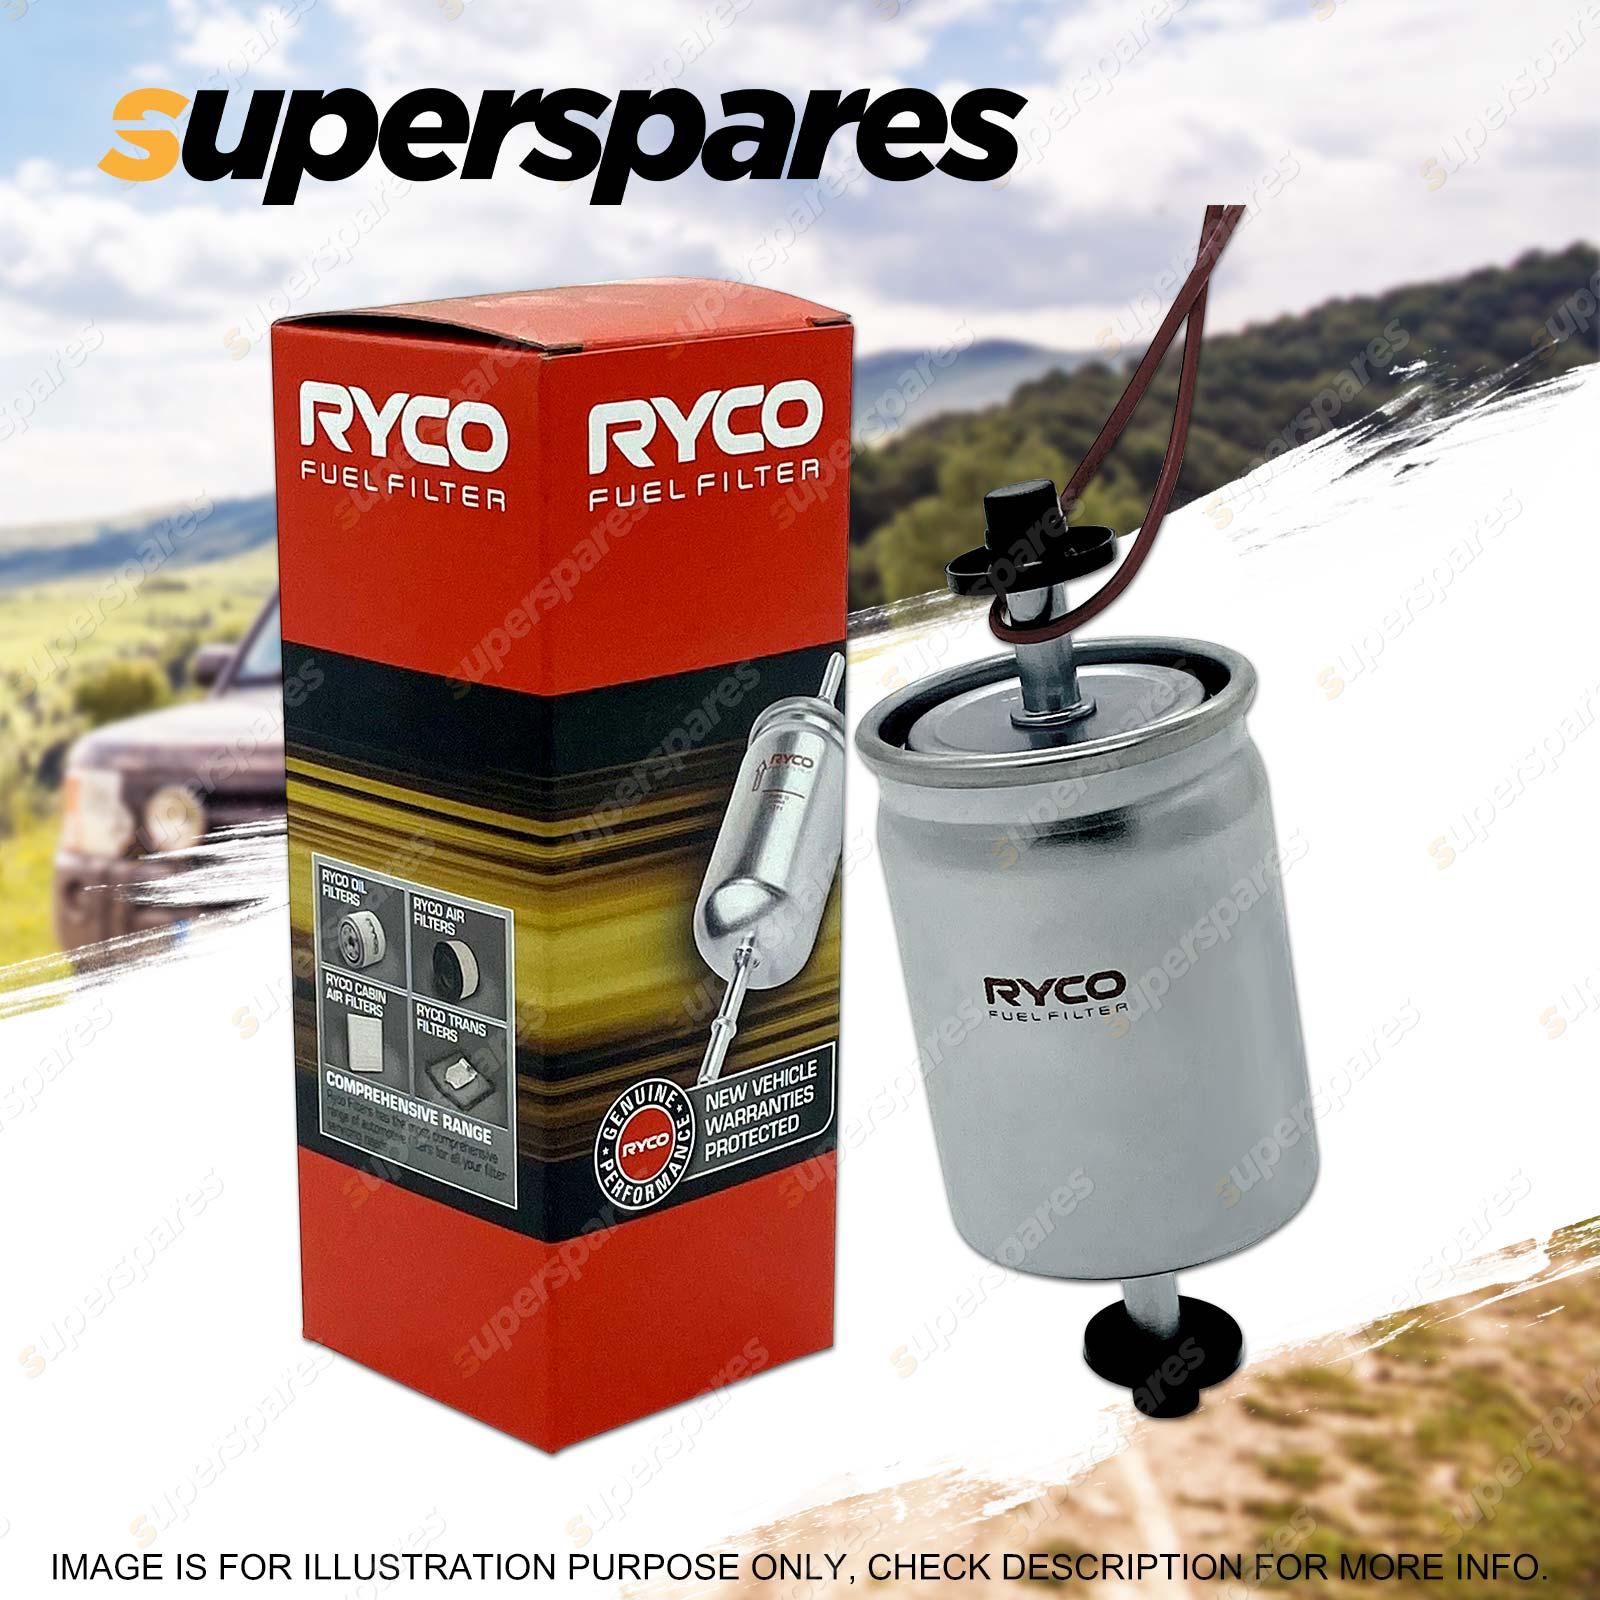 hight resolution of ryco fuel filter for subaru forester sg9 sh9 shm impreza gde gd9 gda gc9 gga gge